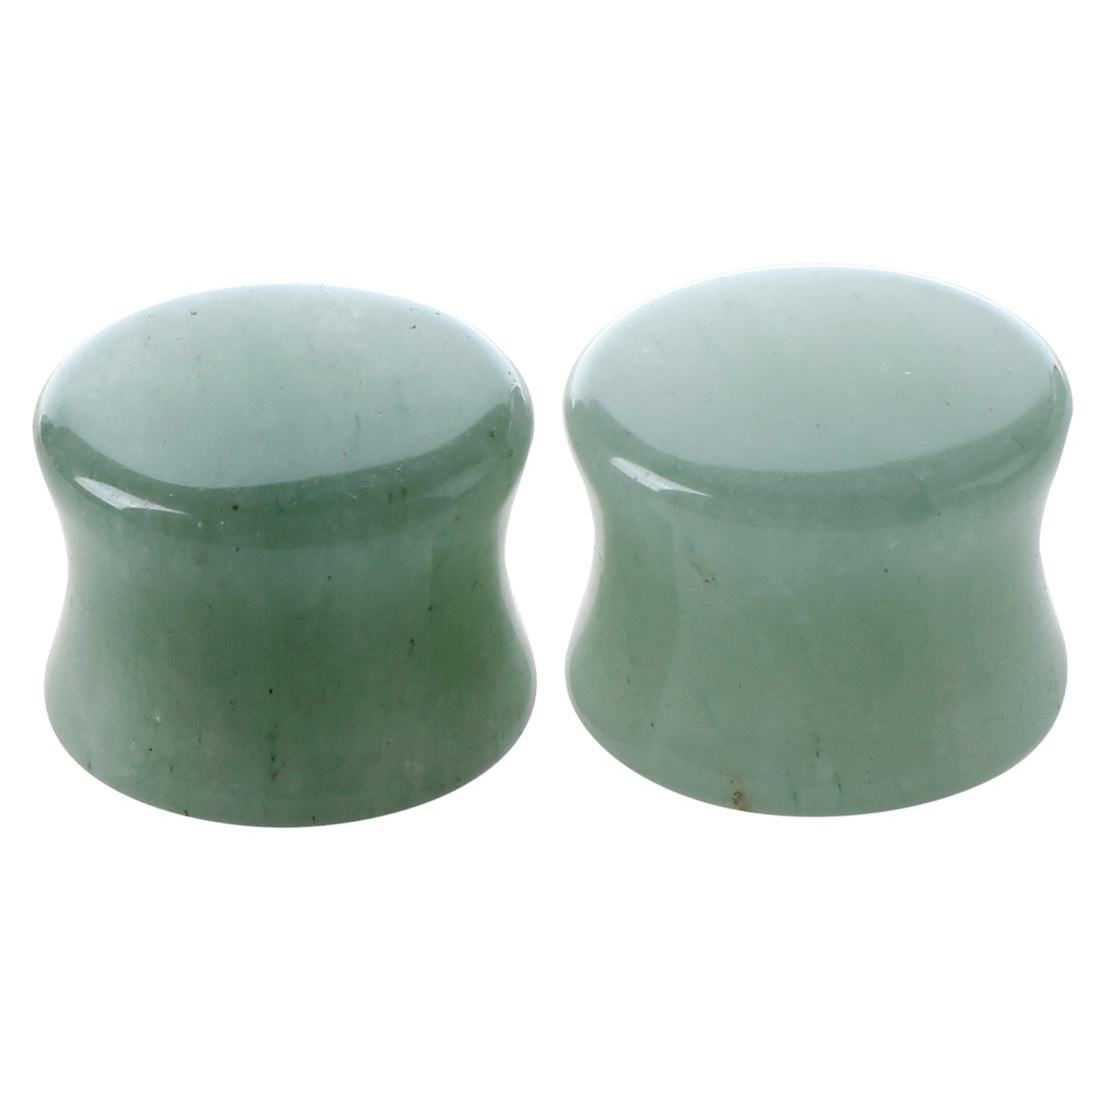 1-Pair-of-Solid-Jade-Stone-Organic-Ear-Plugs-Gauges-Rings-Tunnels-Piercing-Y1X6 thumbnail 2